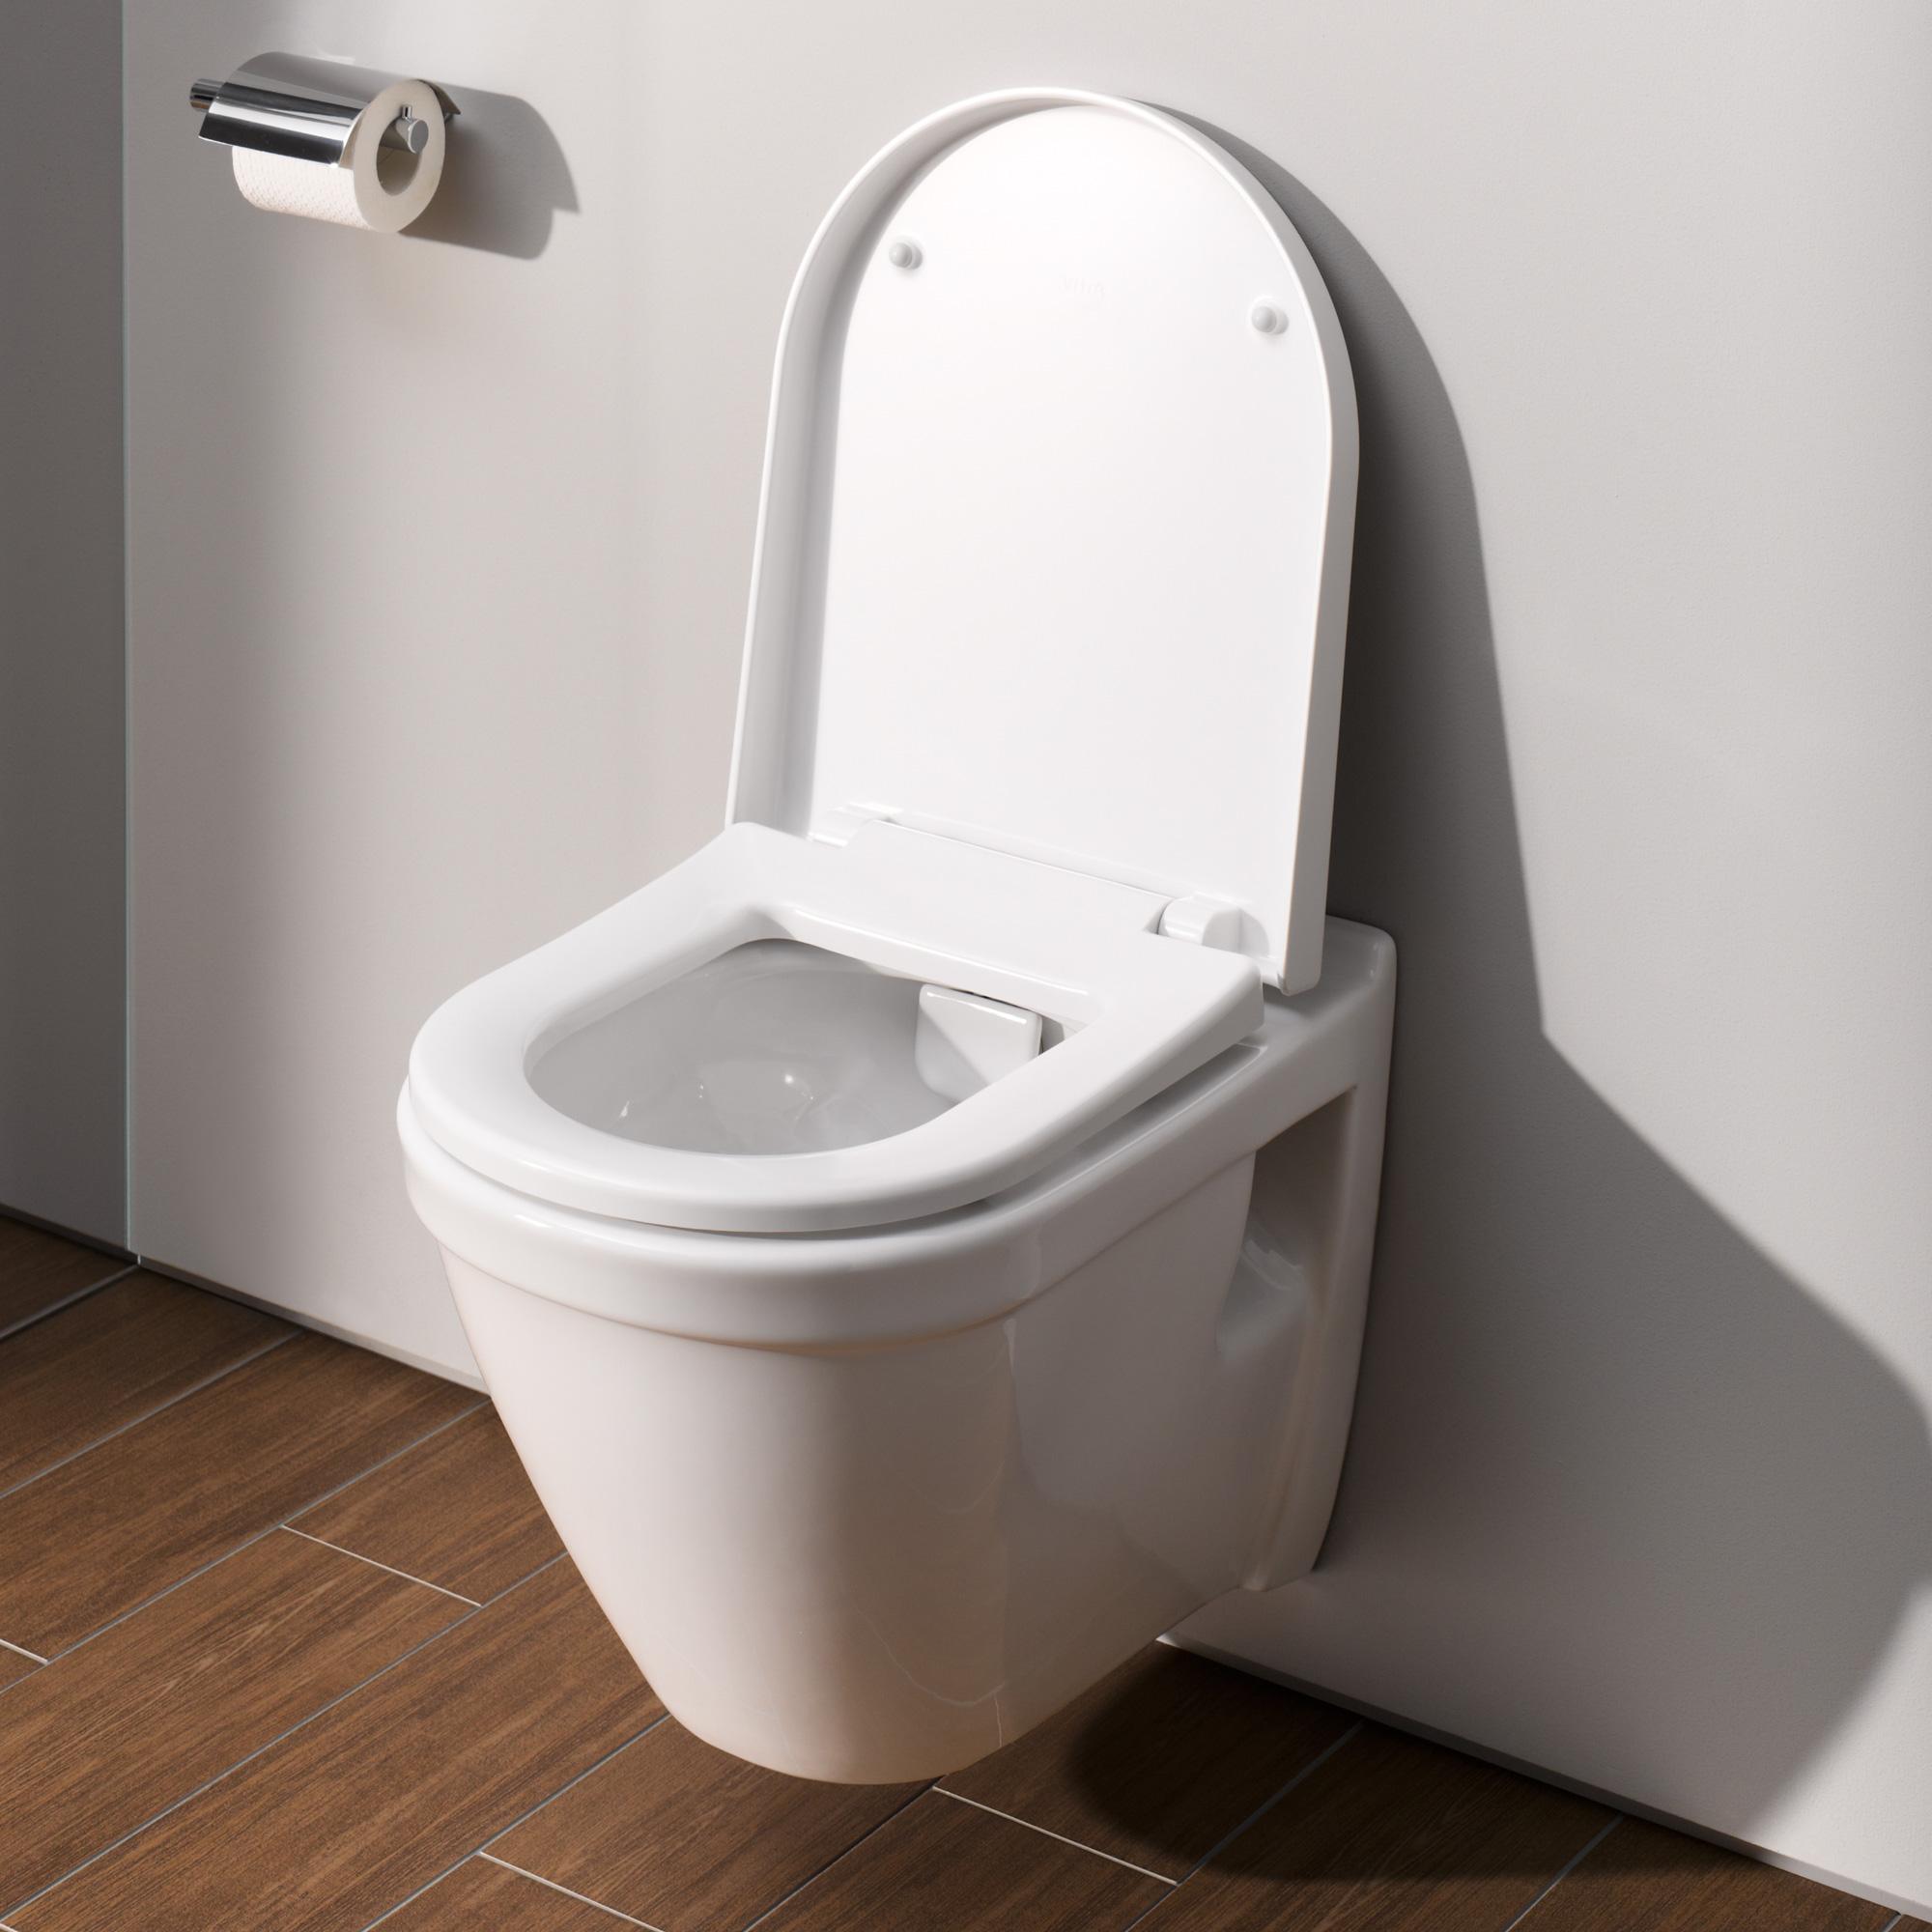 metropole wand wc vitraflush ohne sp lrand tiefsp ler. Black Bedroom Furniture Sets. Home Design Ideas